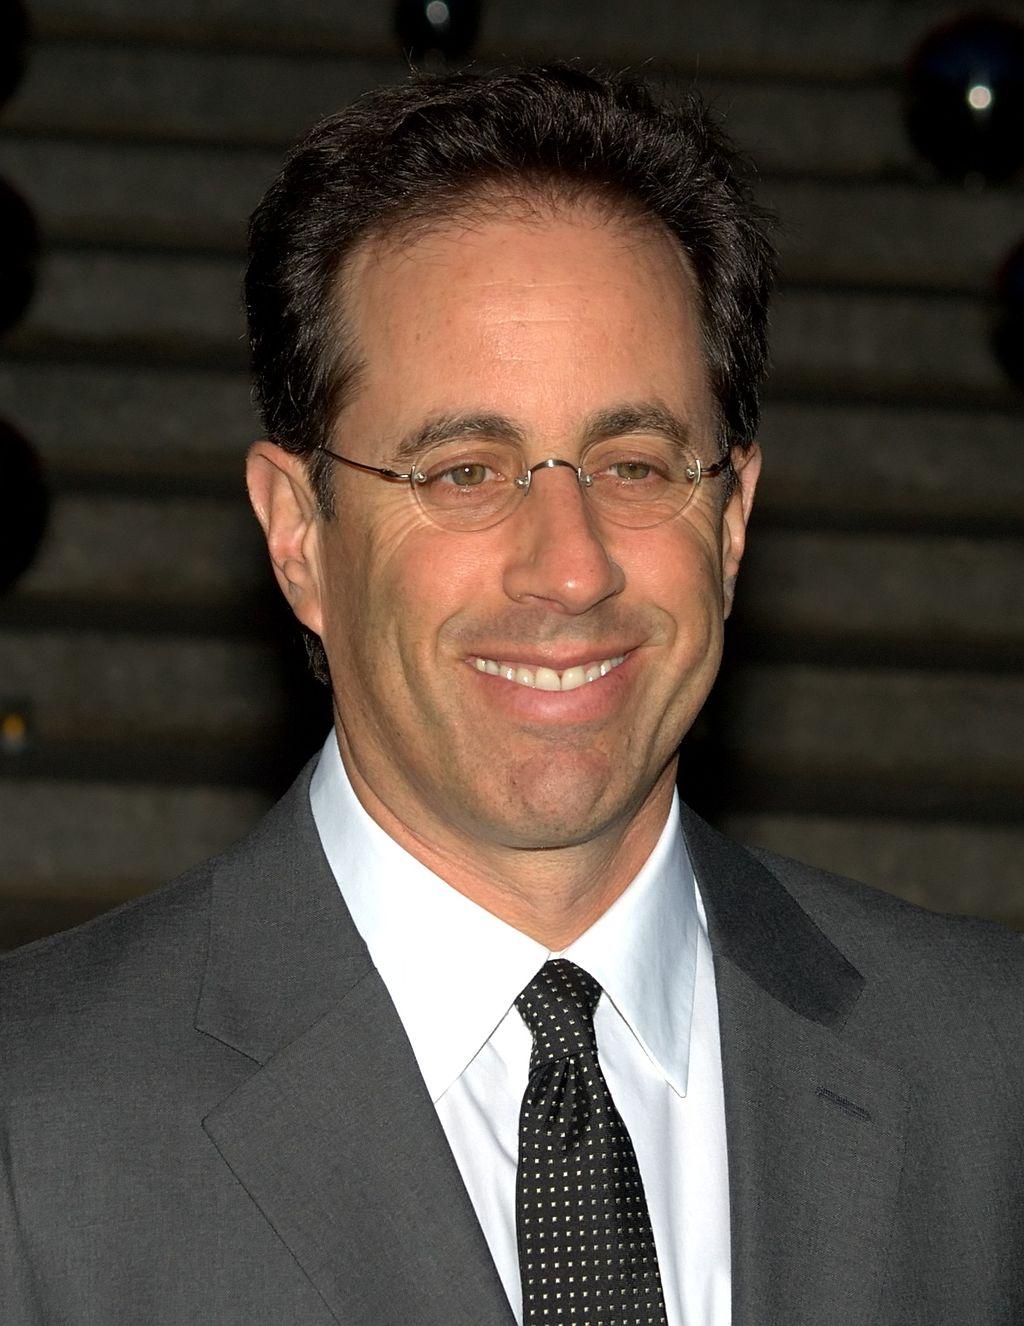 1024px-Jerry_Seinfeld_by_David_Shankbone